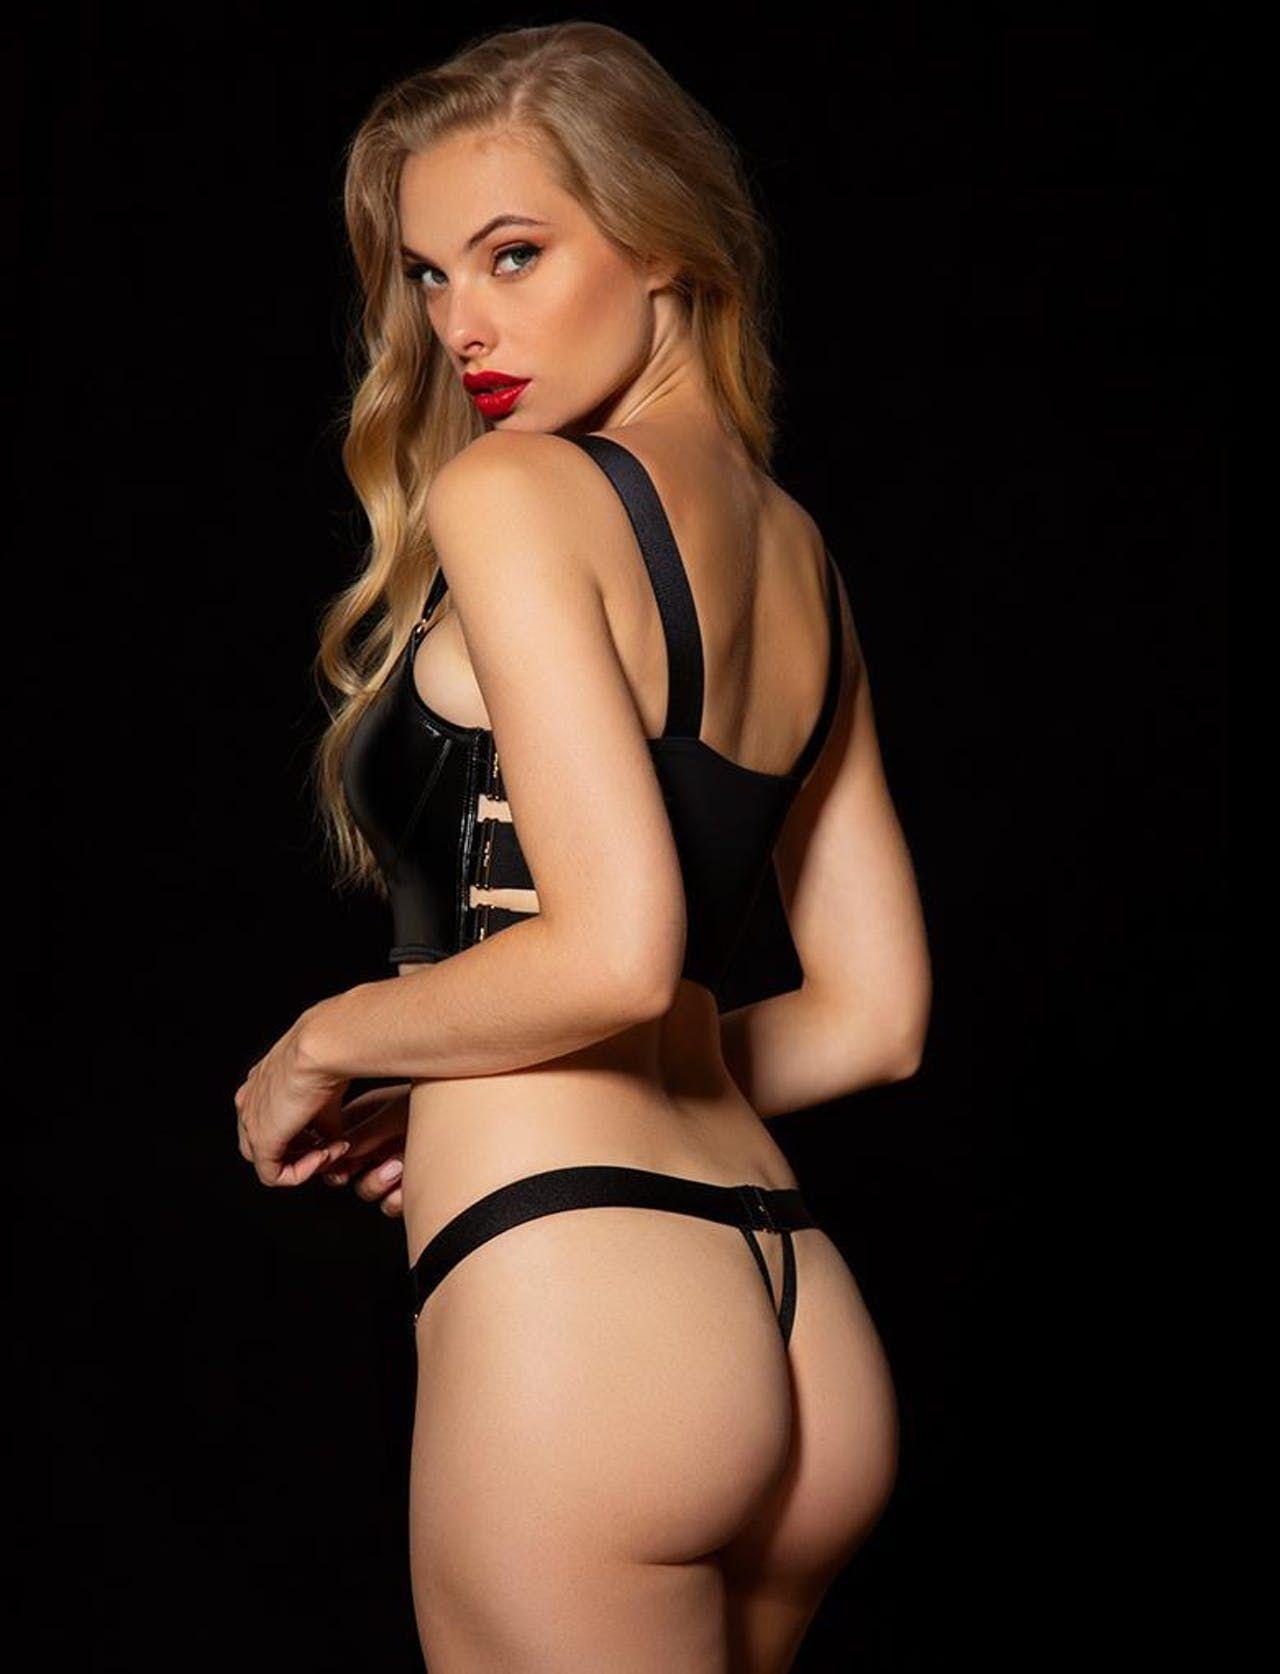 Selfie Panties Patrizia Pellegrino  nudes (12 photo), Instagram, lingerie